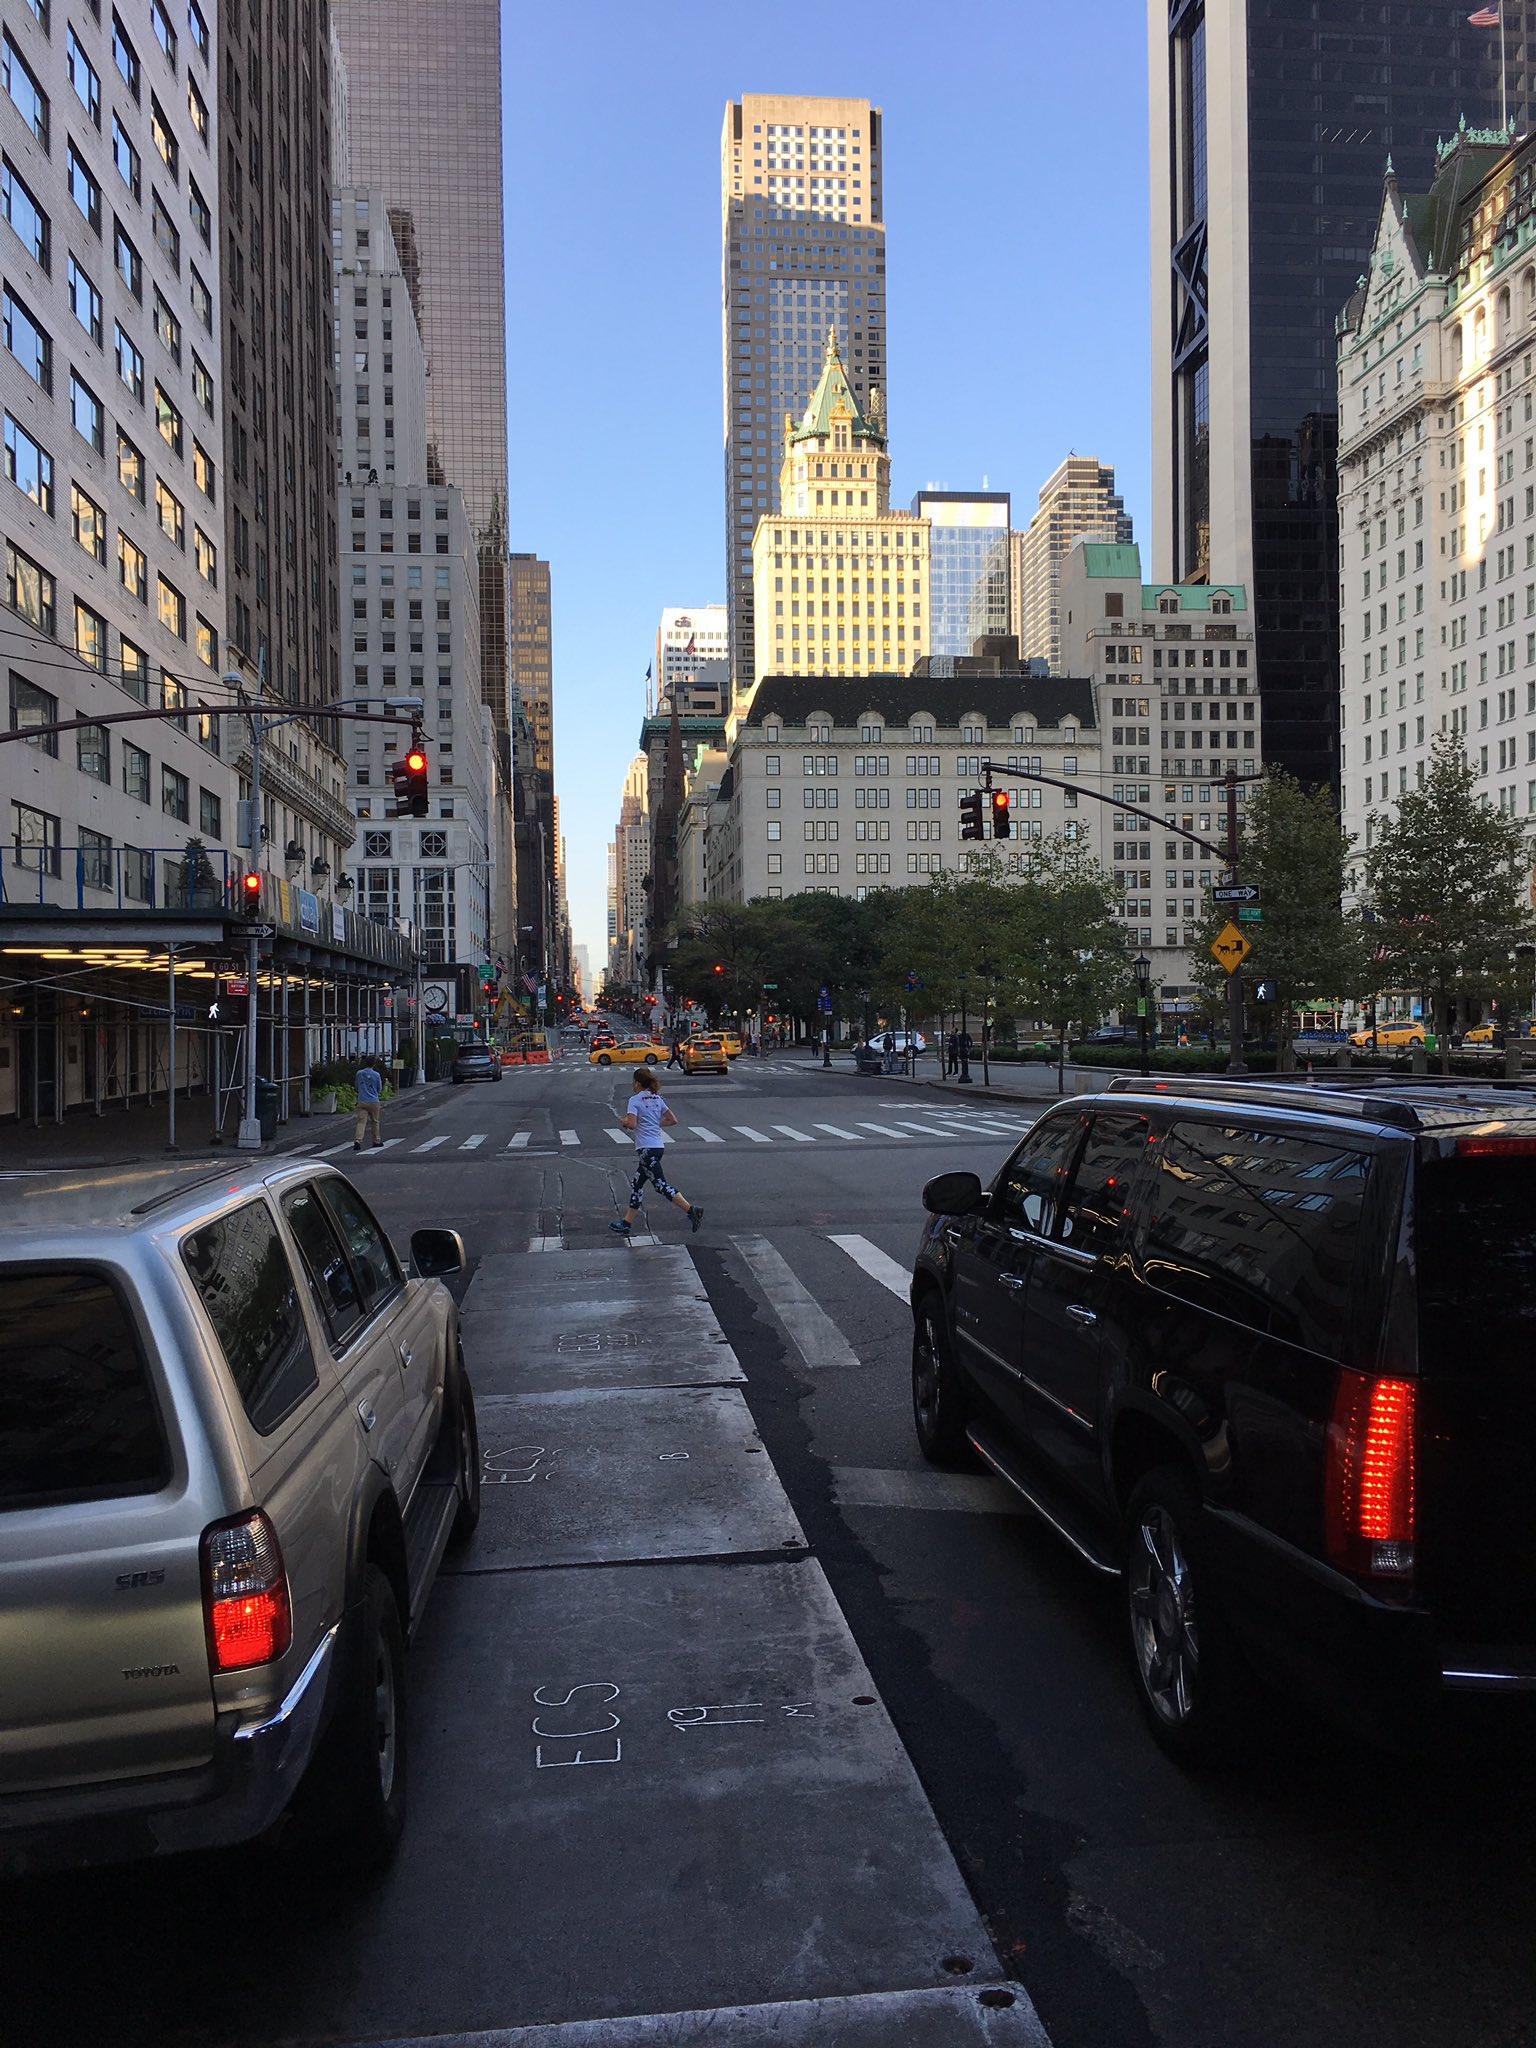 5th Ave...8:00am going to work! 5a Ave... 8:00 de la mañana... camino del trabajo! �������� @usopen @WTA https://t.co/88AnXSv0uE